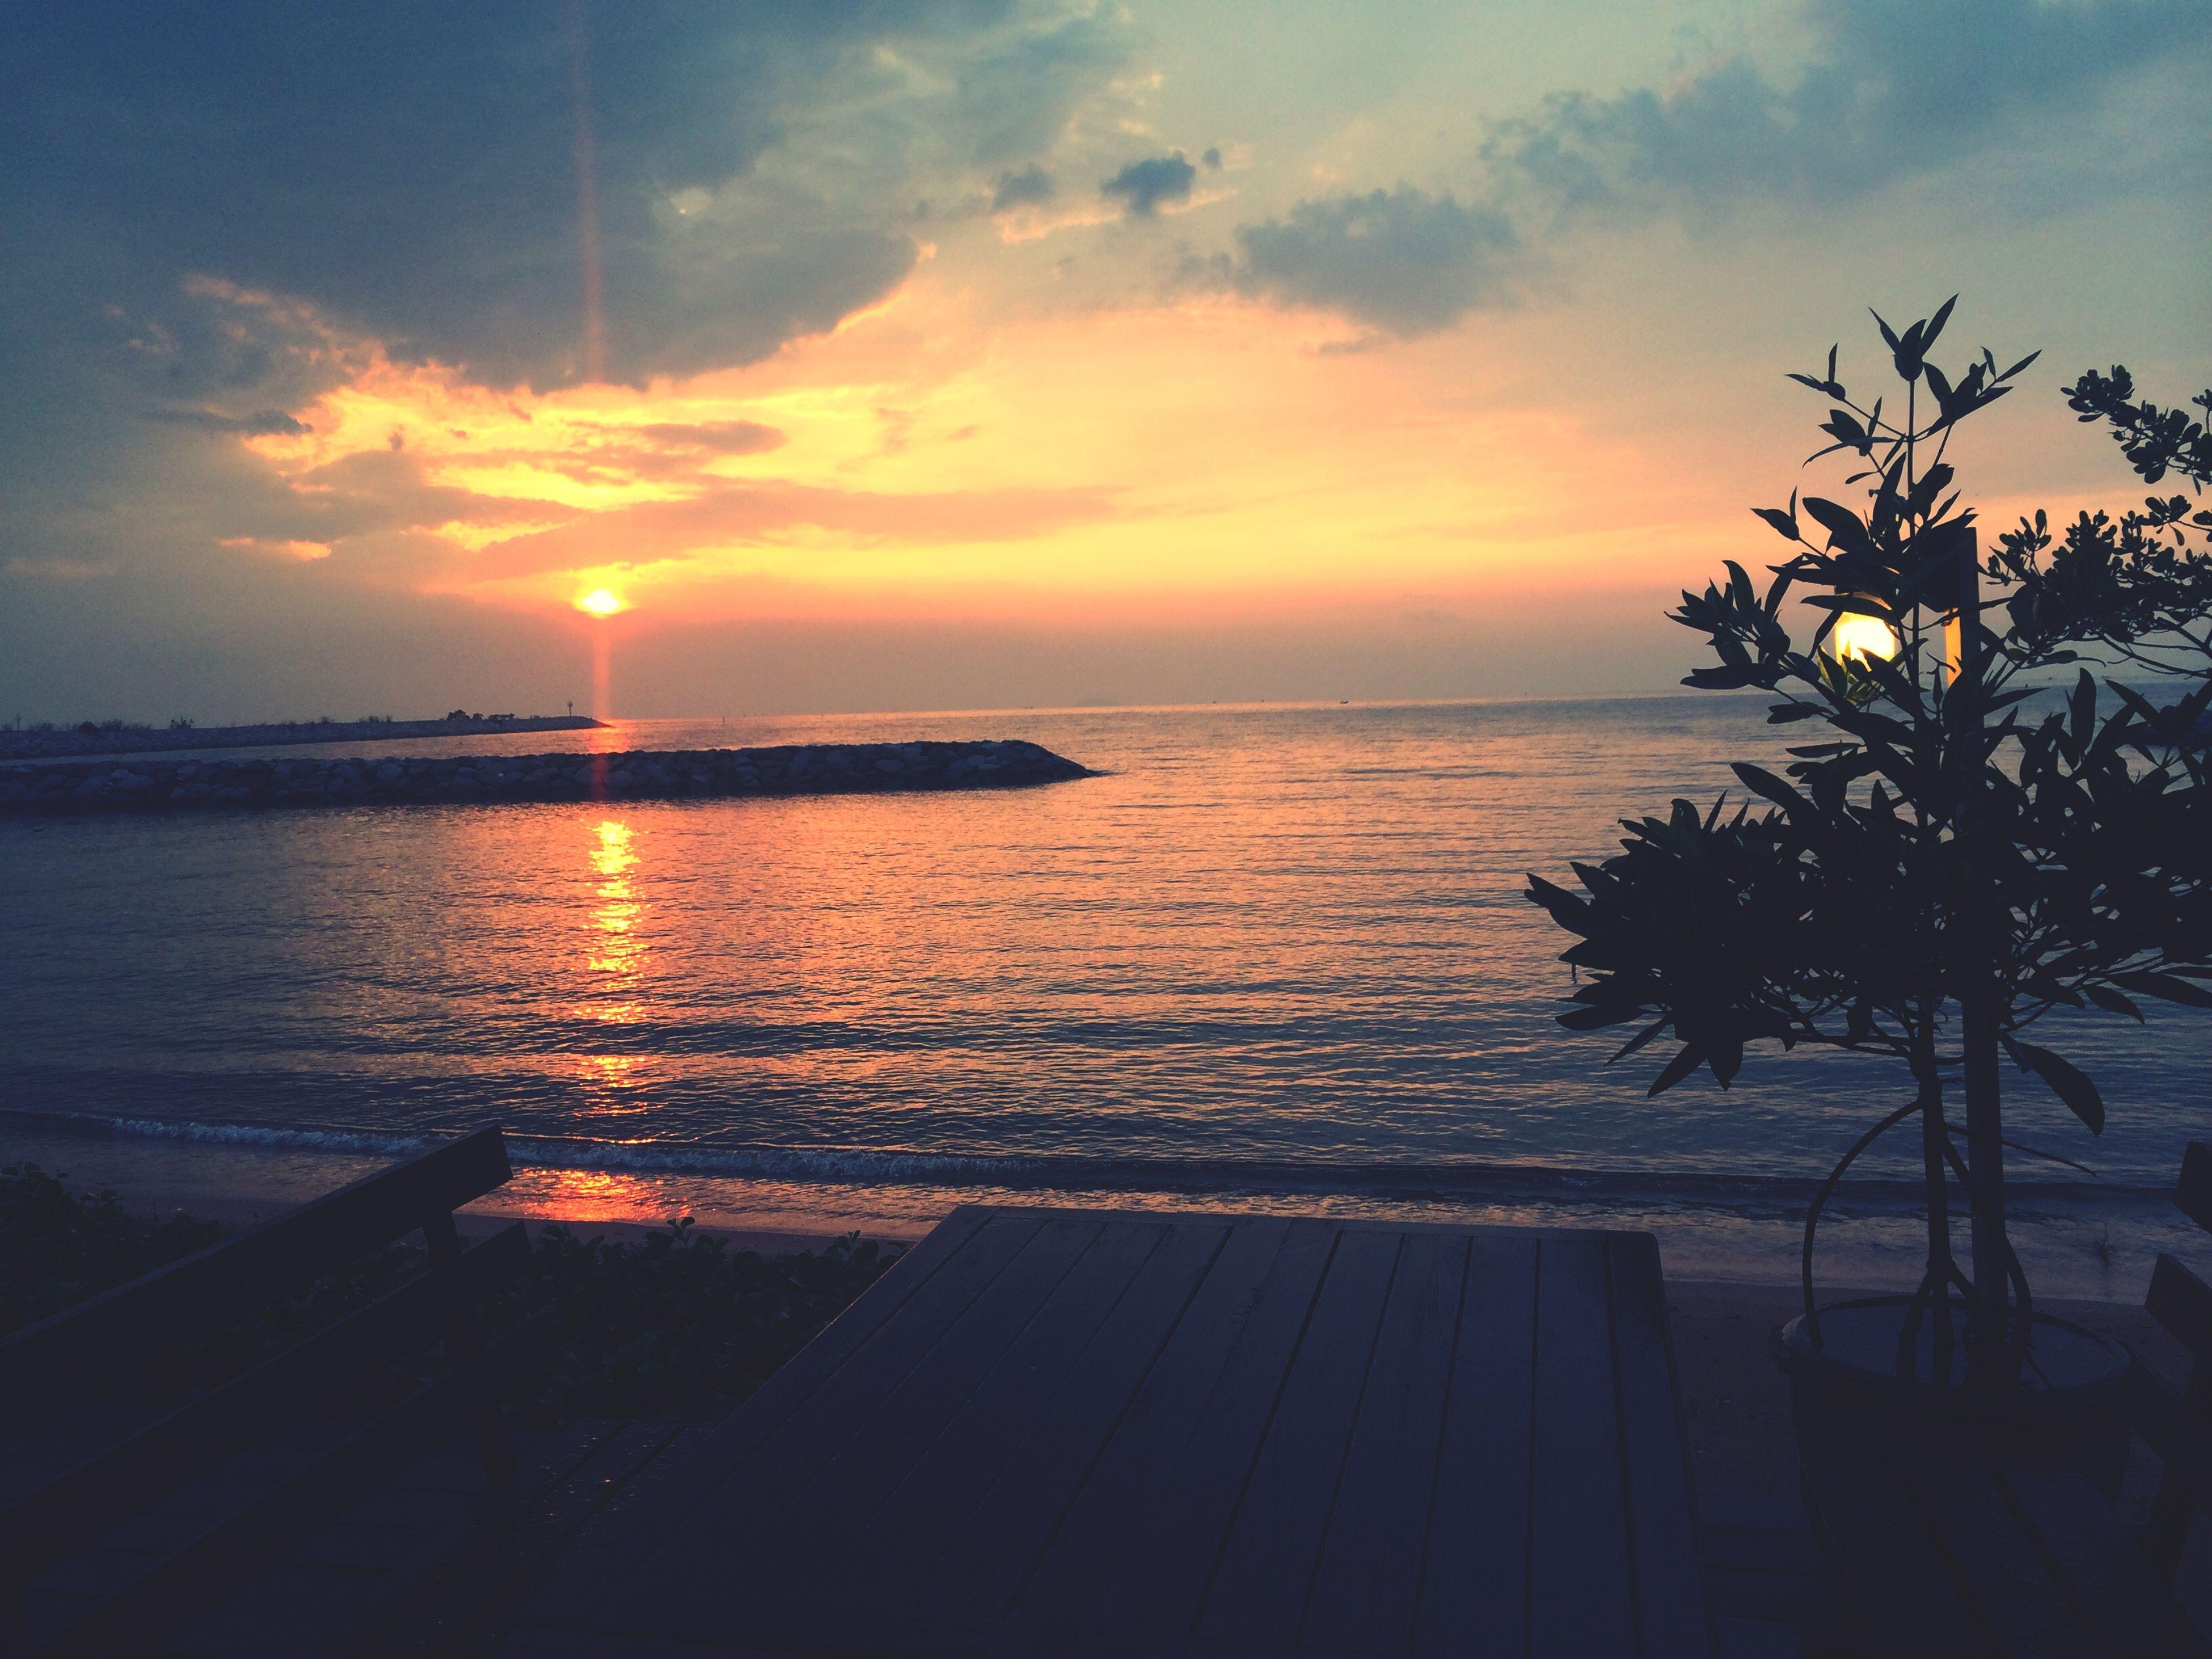 sea, sunset, horizon over water, water, scenics, tranquil scene, tranquility, sky, beauty in nature, sun, beach, silhouette, orange color, idyllic, nature, shore, reflection, cloud - sky, sunlight, ocean